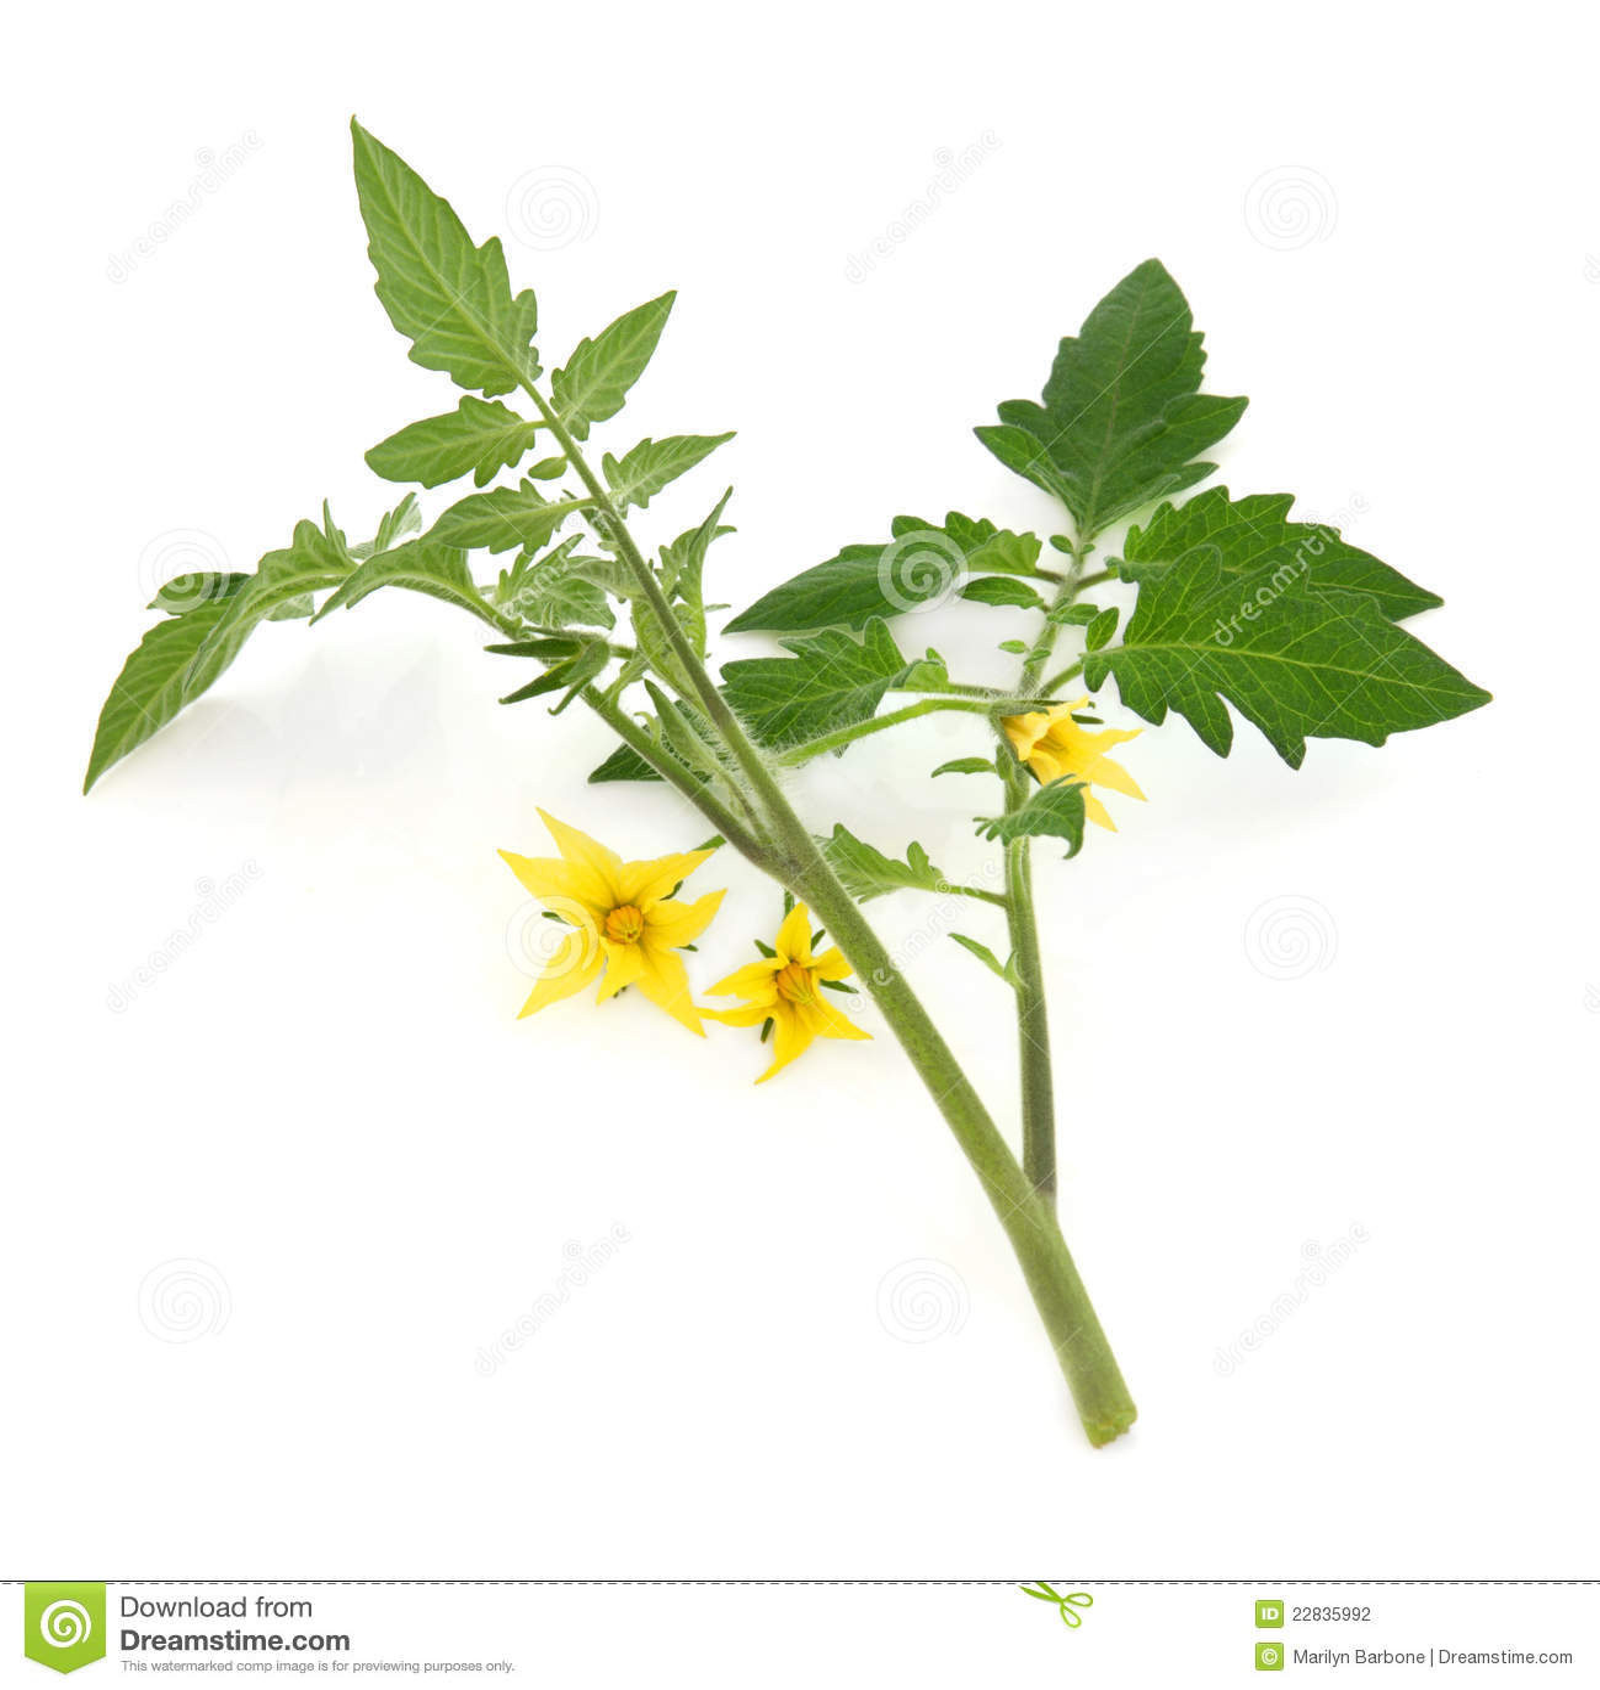 Tomato Plant Anatomy